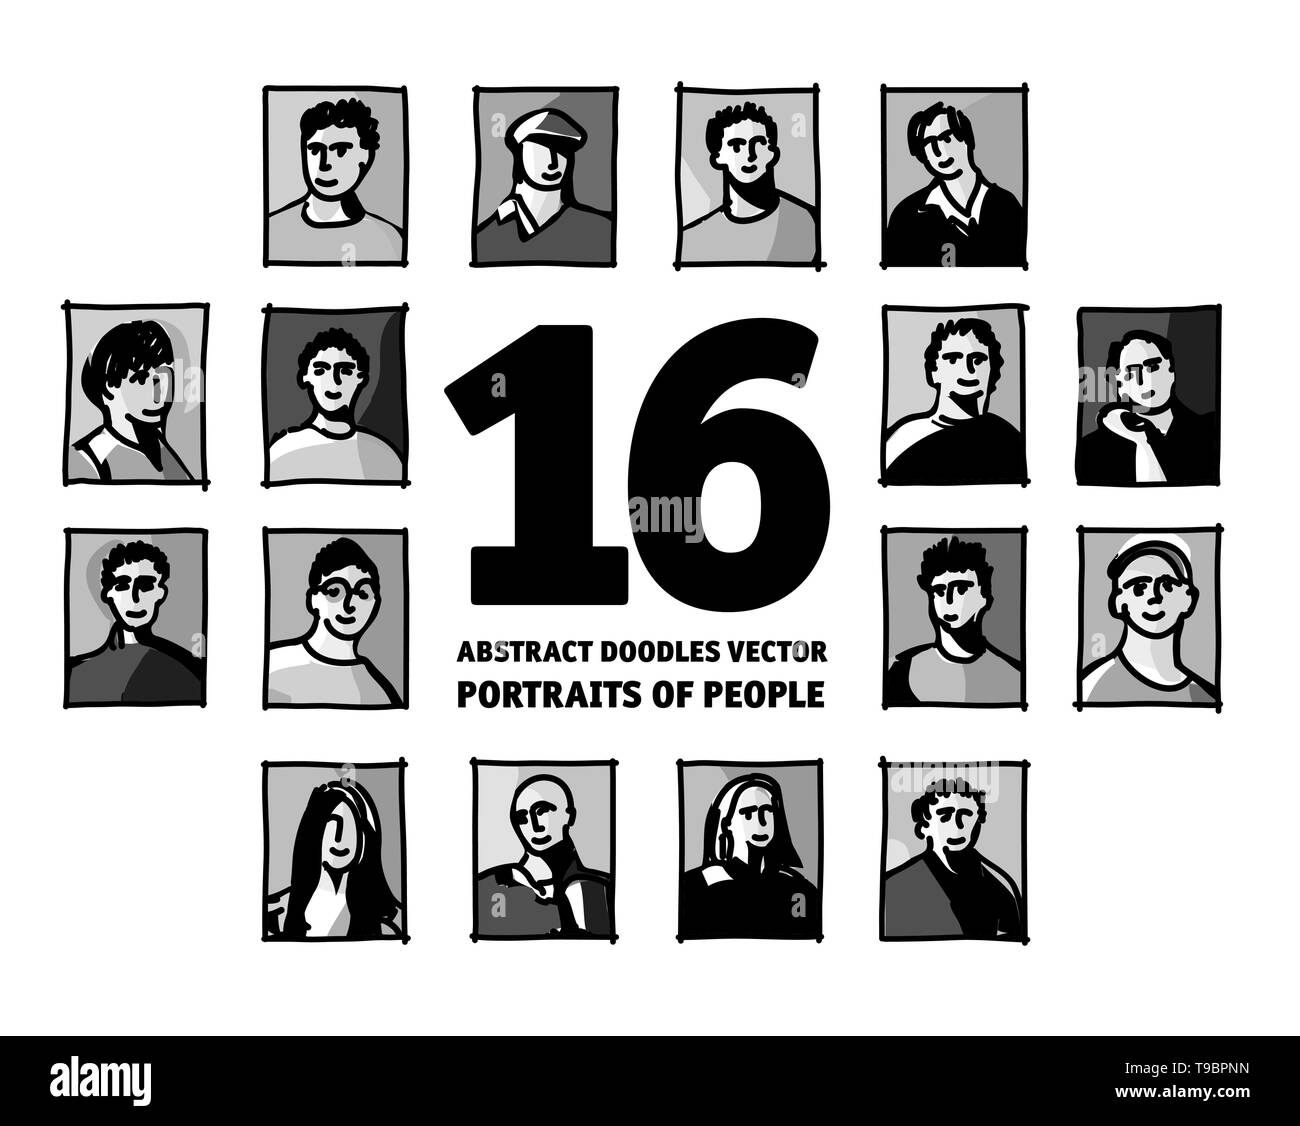 Doodles people portraits set avatars faces monochrome. Black and white vector illustration EPS8 - Stock Image